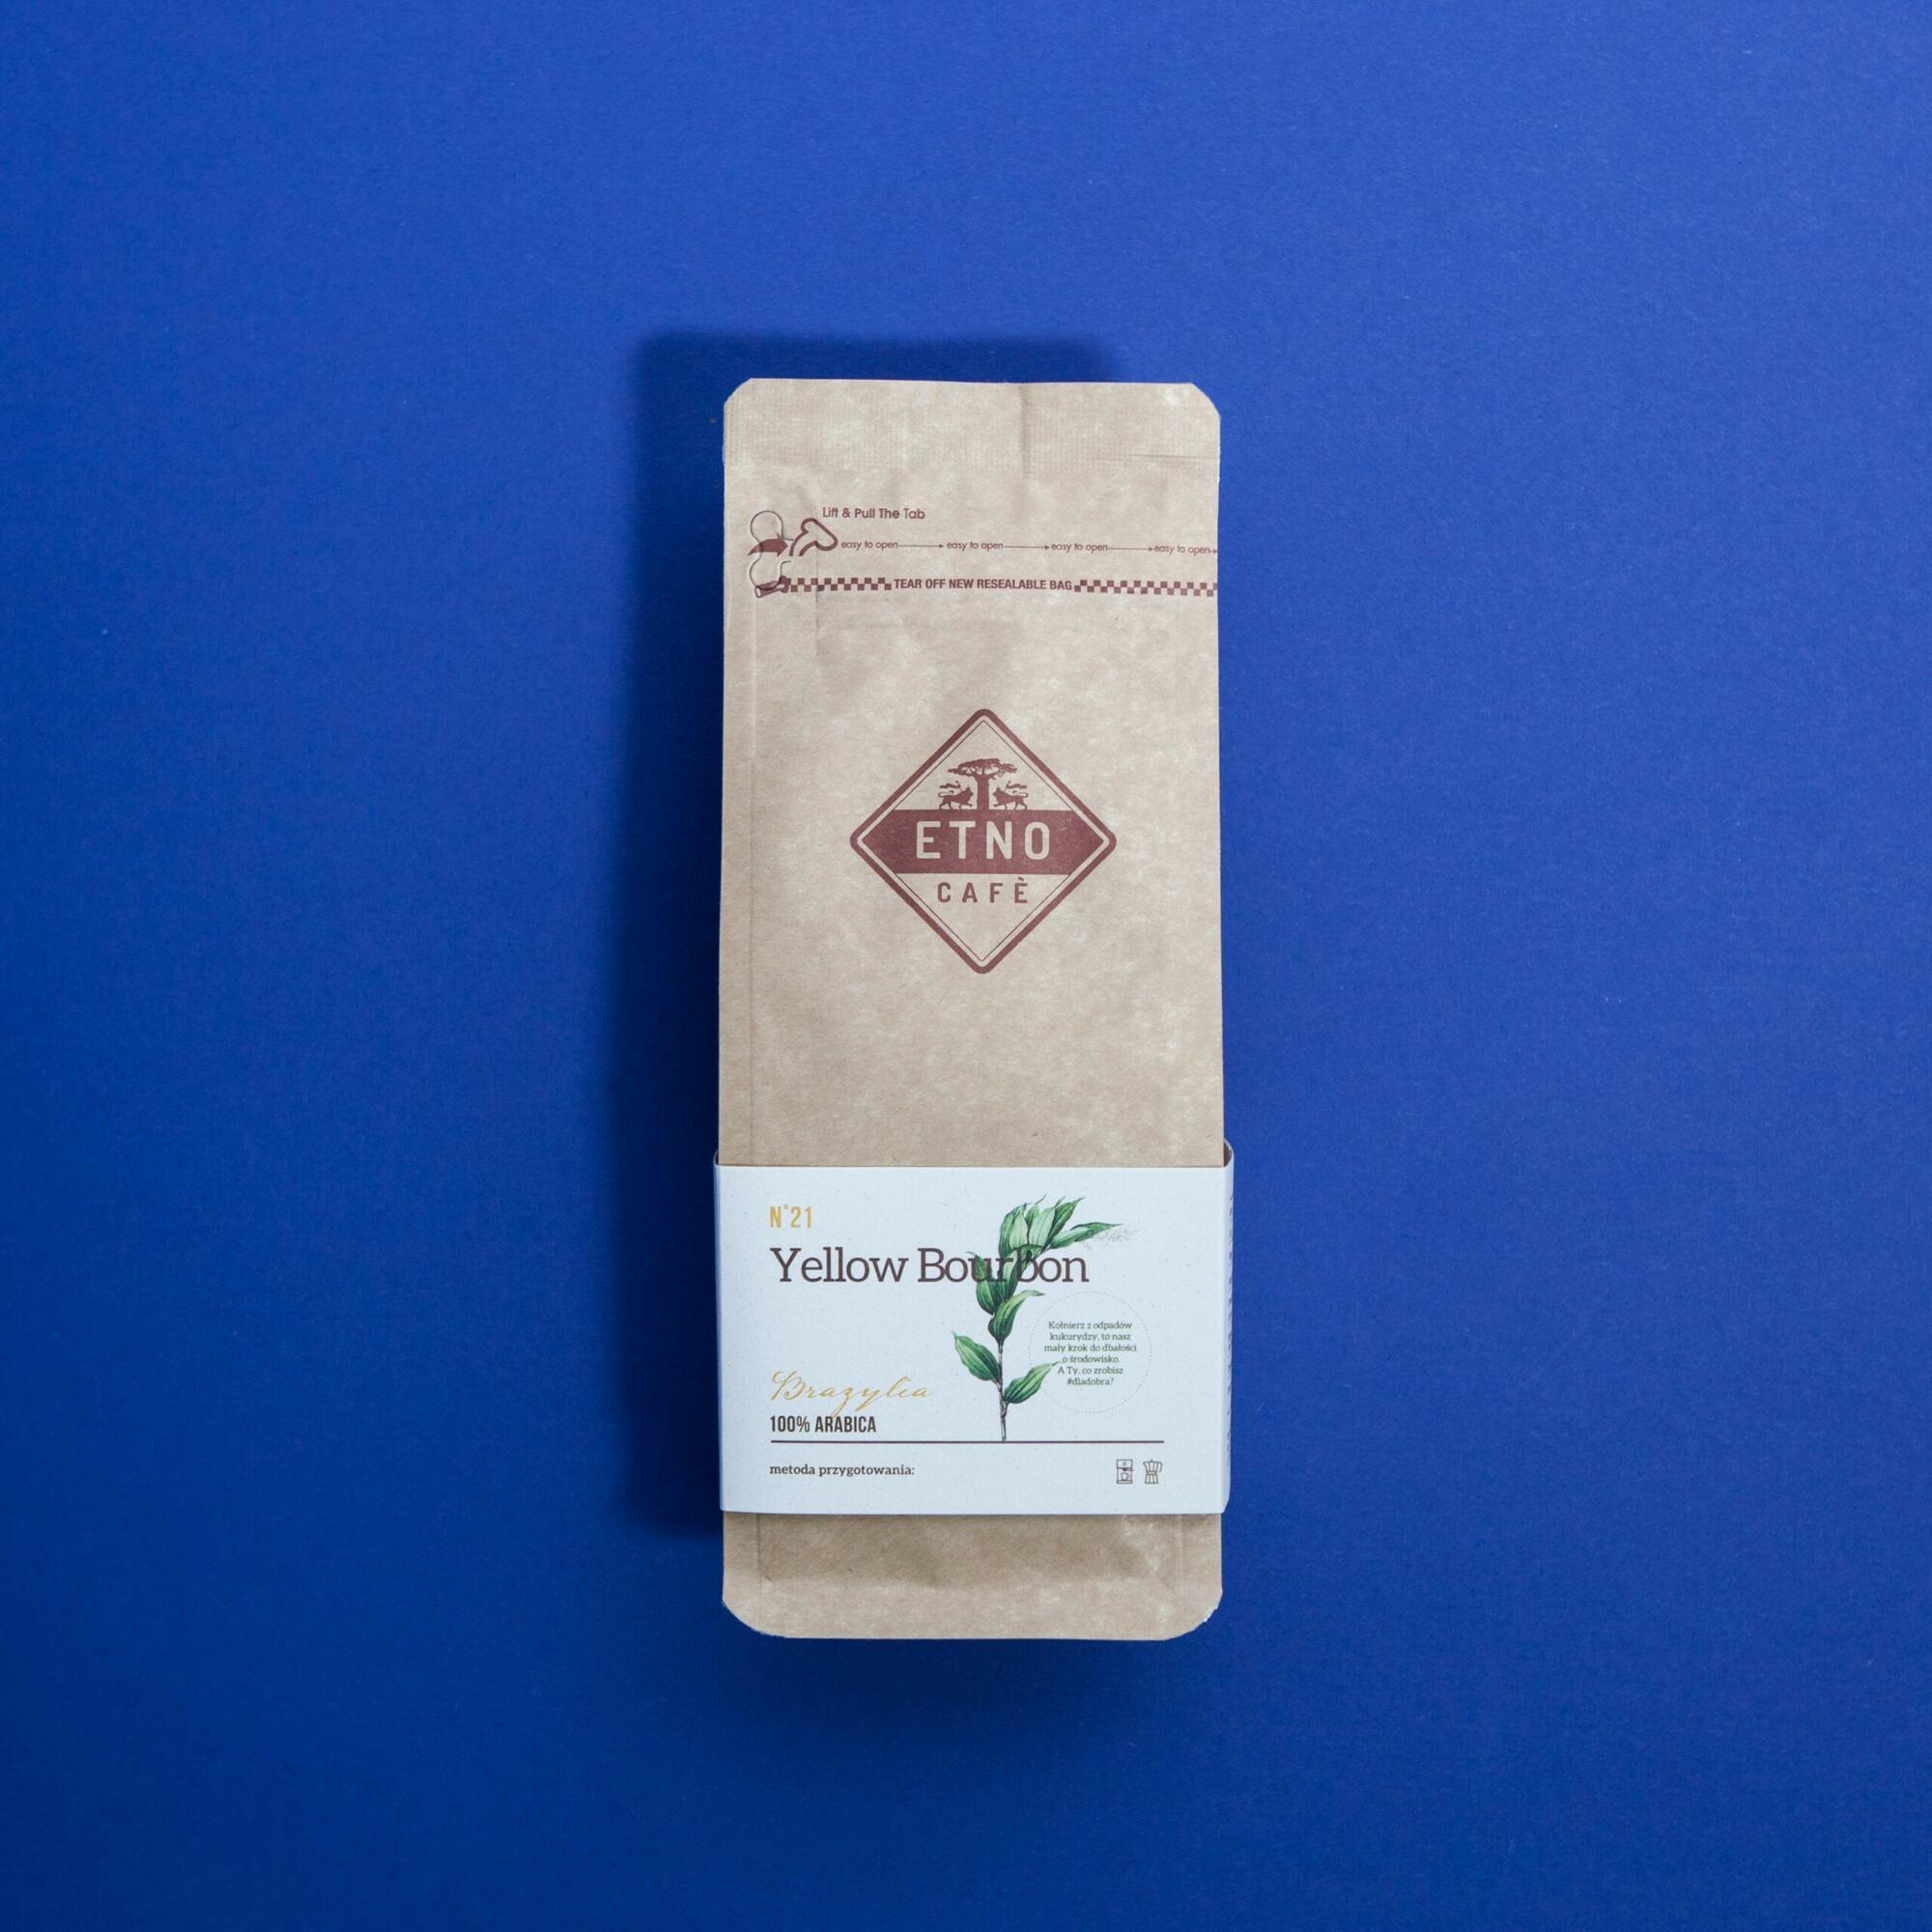 Etno cafe Yellow Bourbon 250g - Coffee Gang | JestemSlow.pl